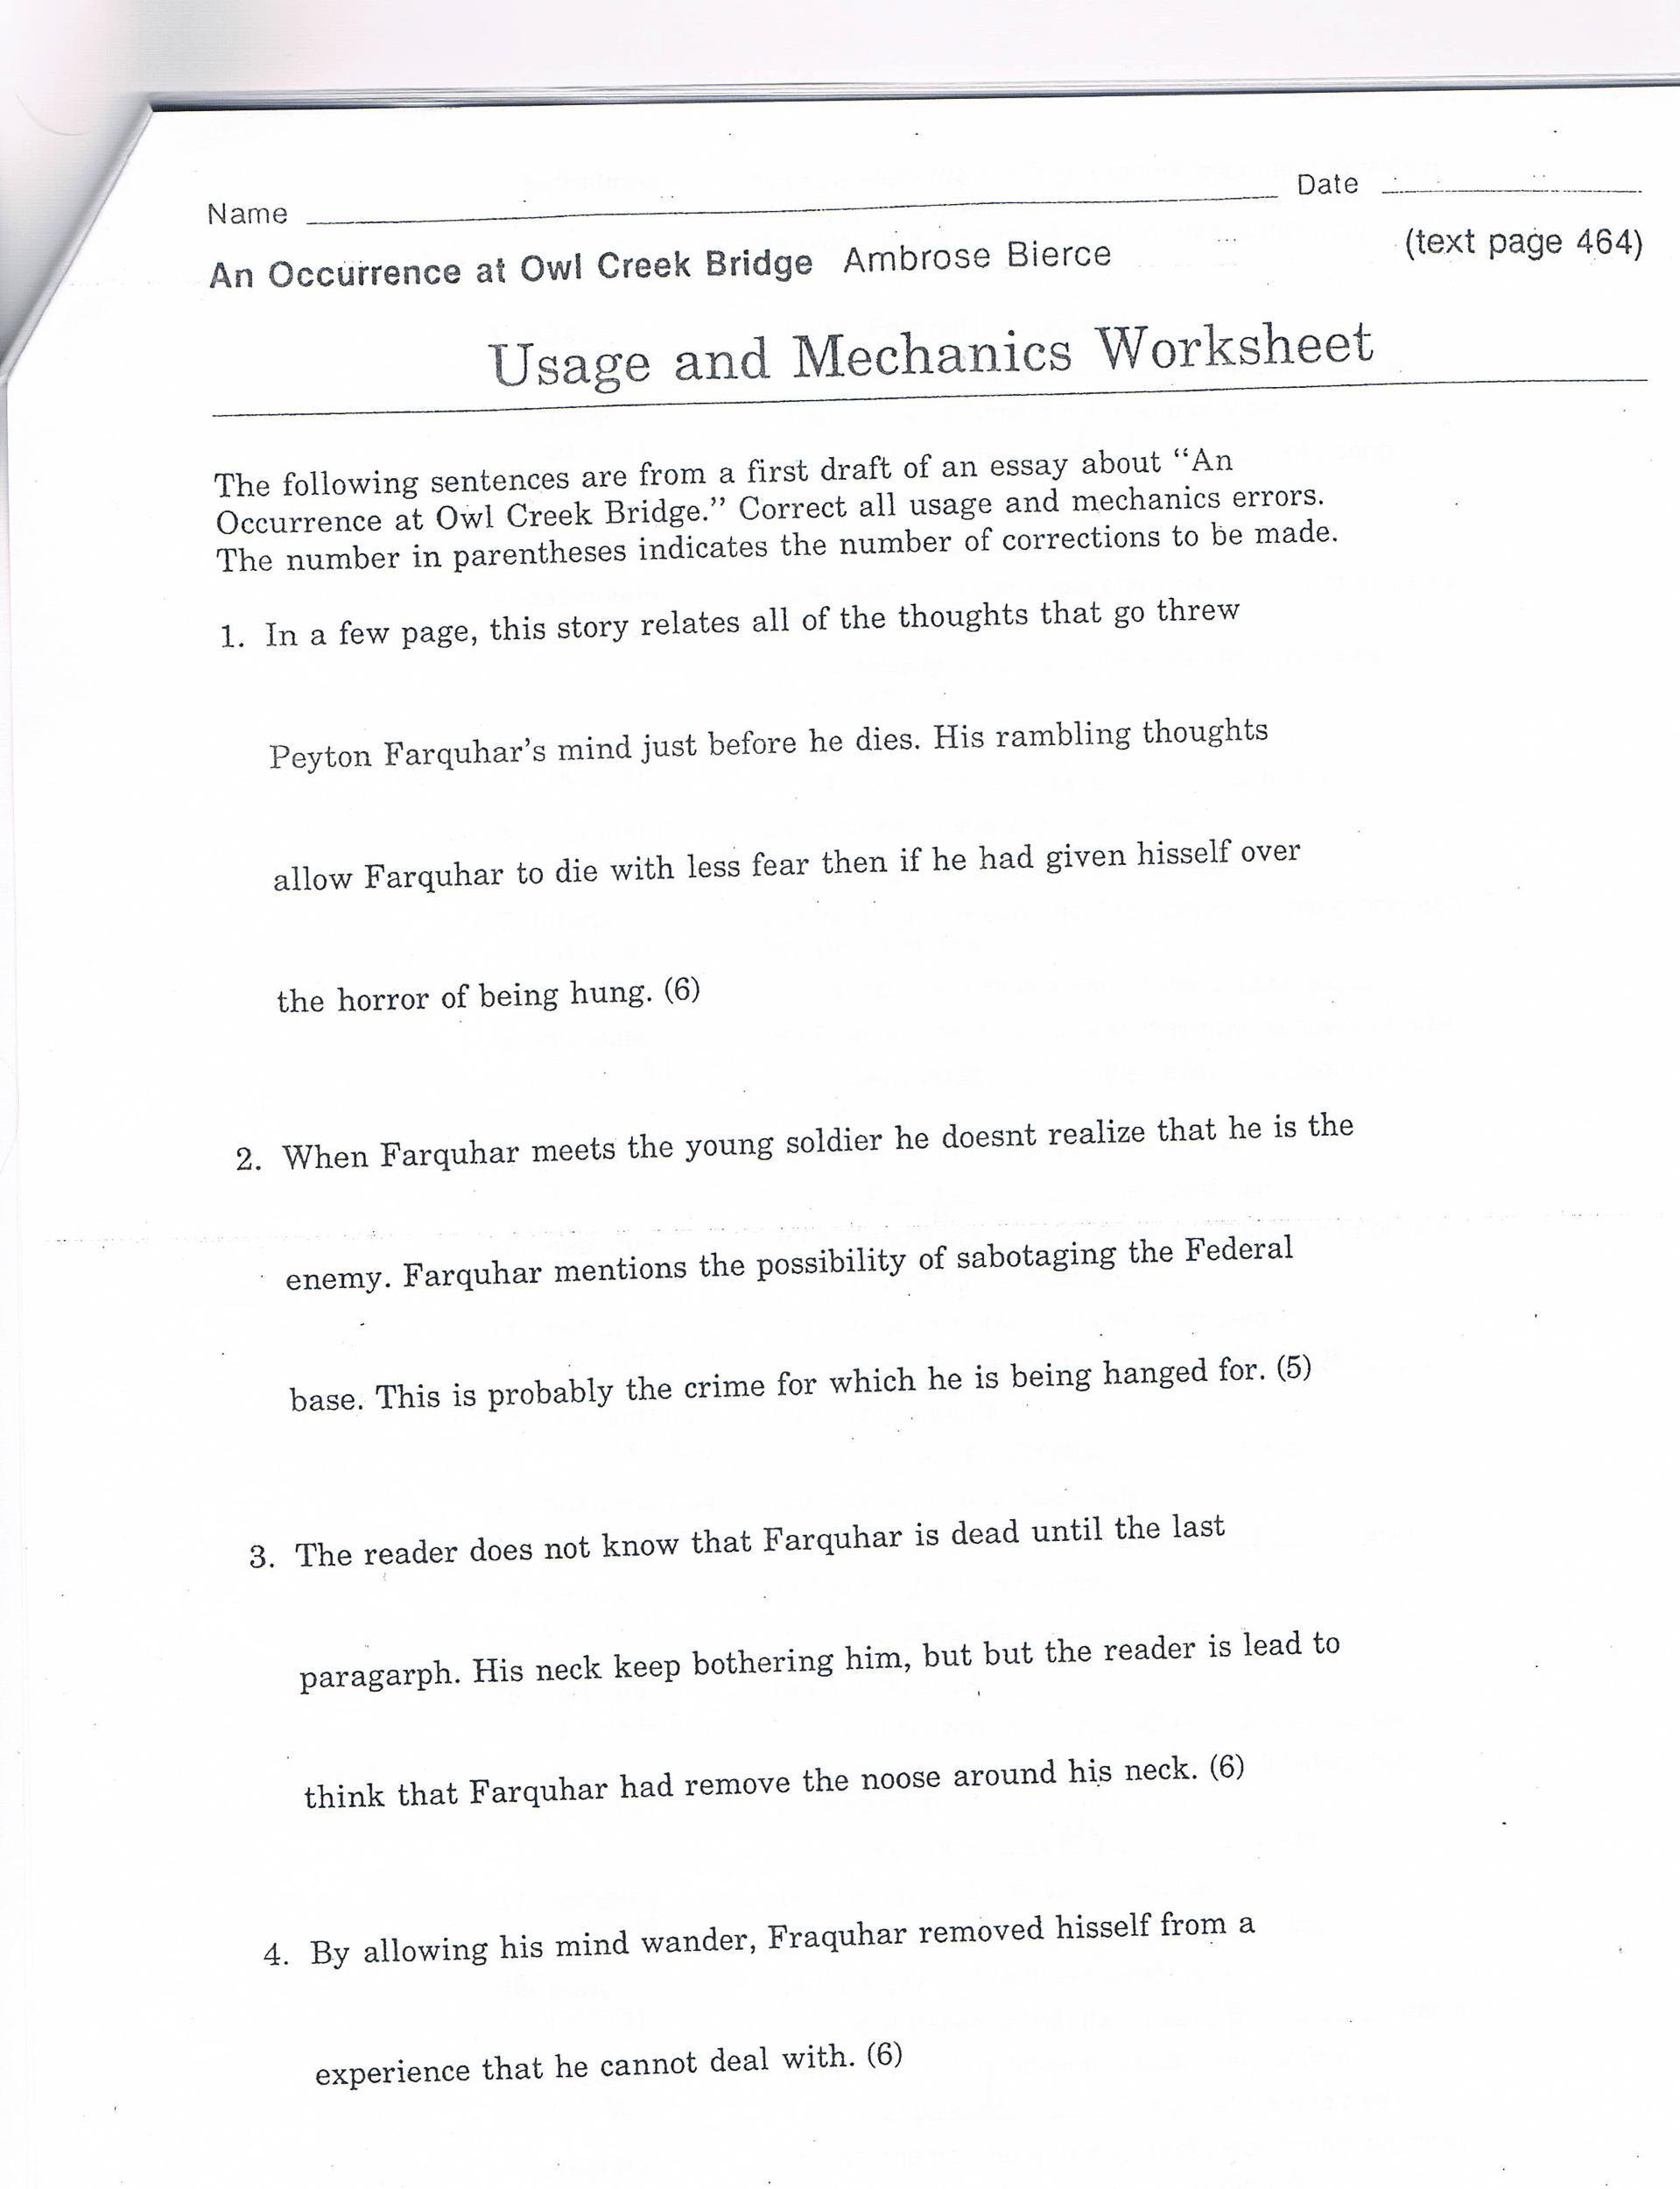 Usage And Mechanics Worksheet Answers